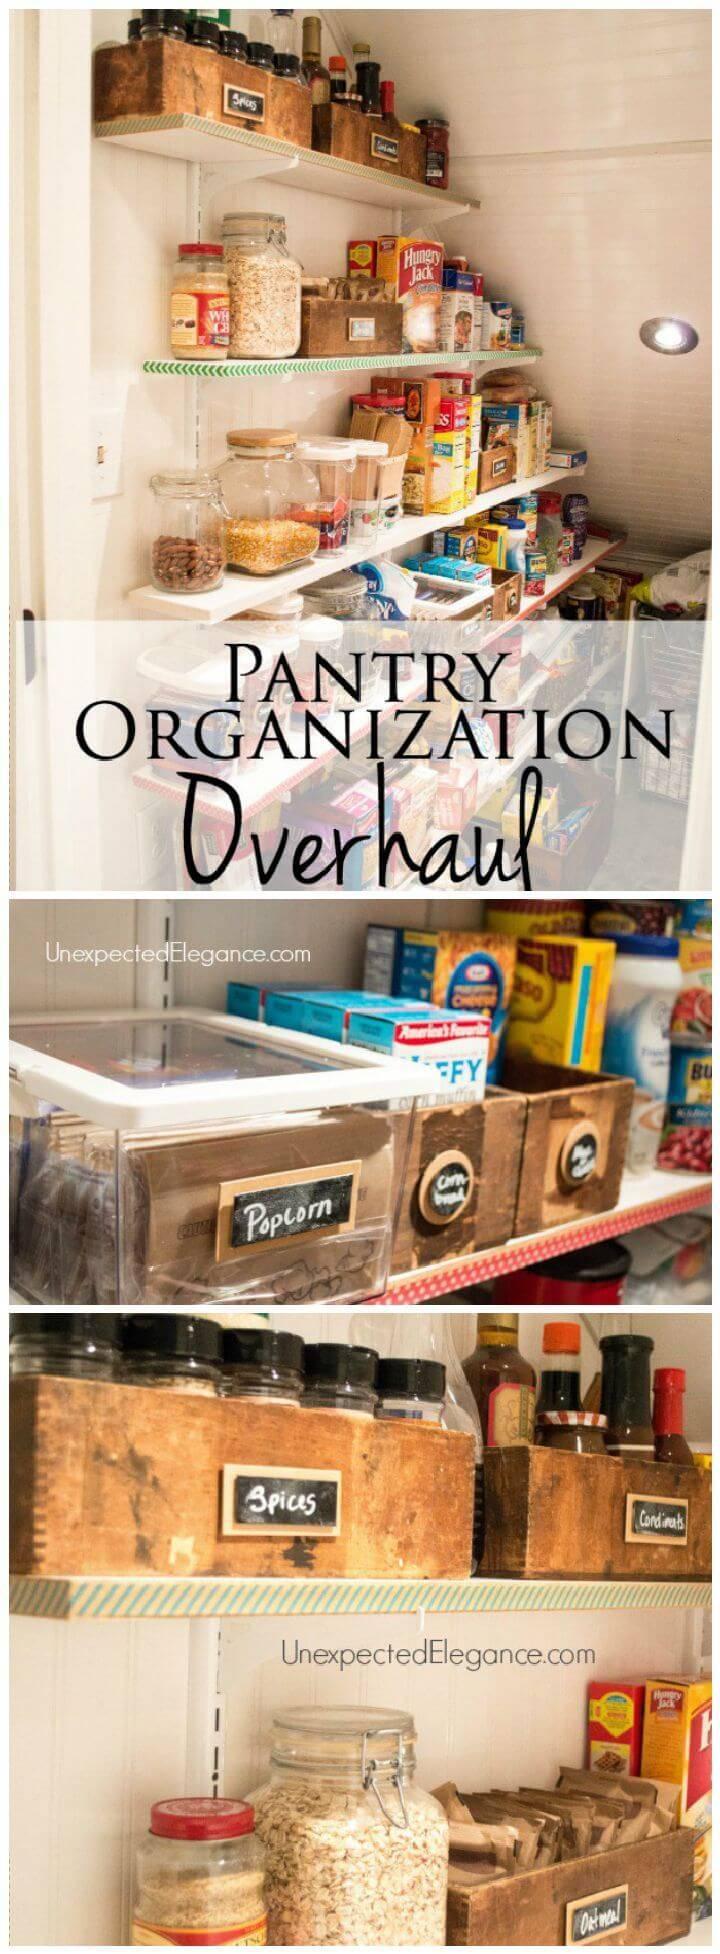 Pantry Organization Overhaul